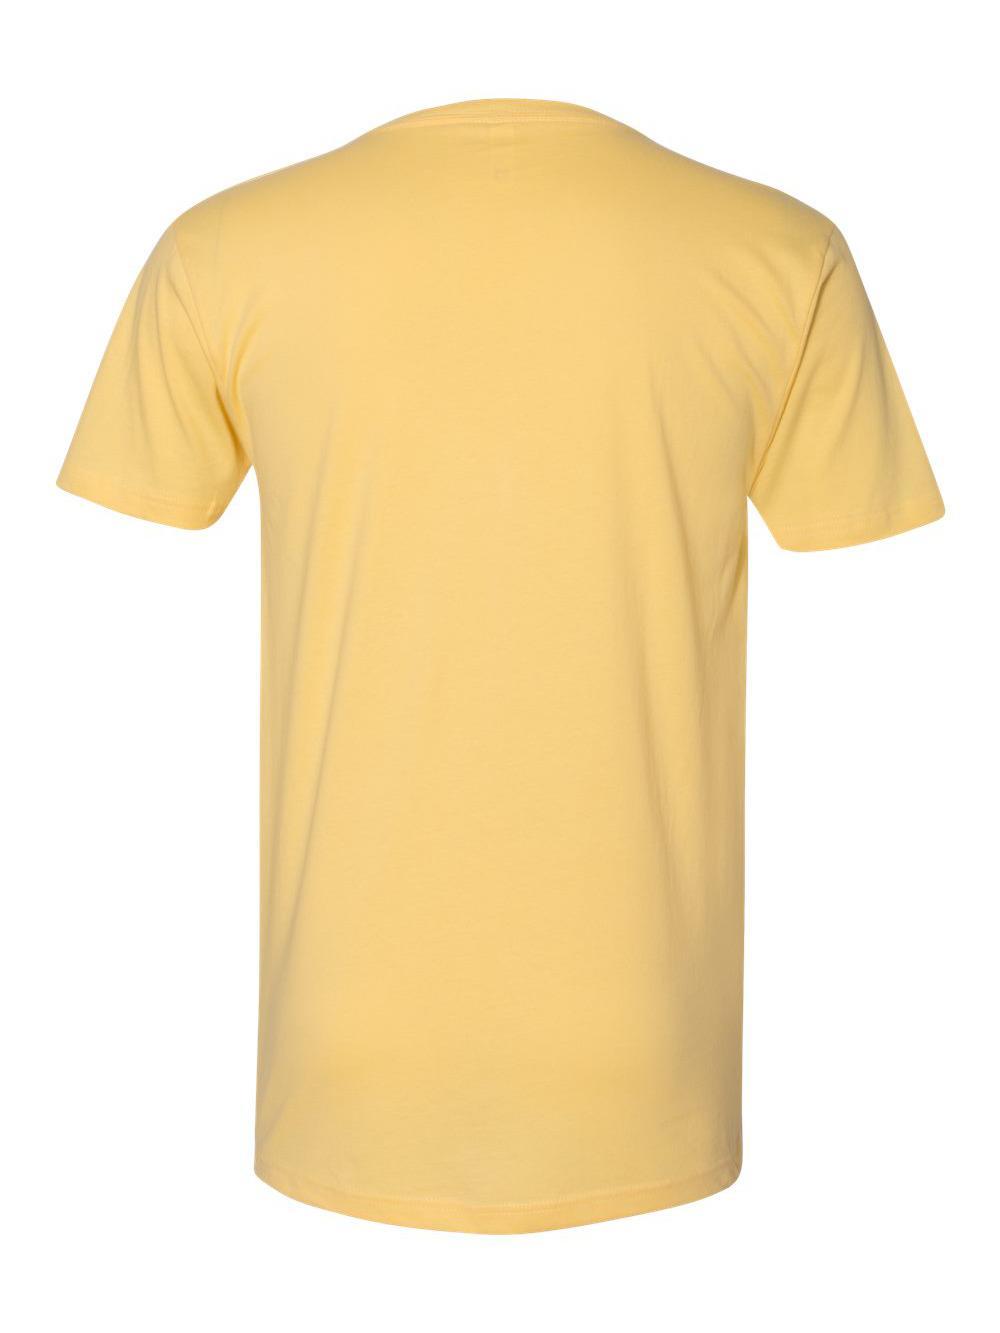 Next-Level-Premium-Short-Sleeve-V-3200 thumbnail 4